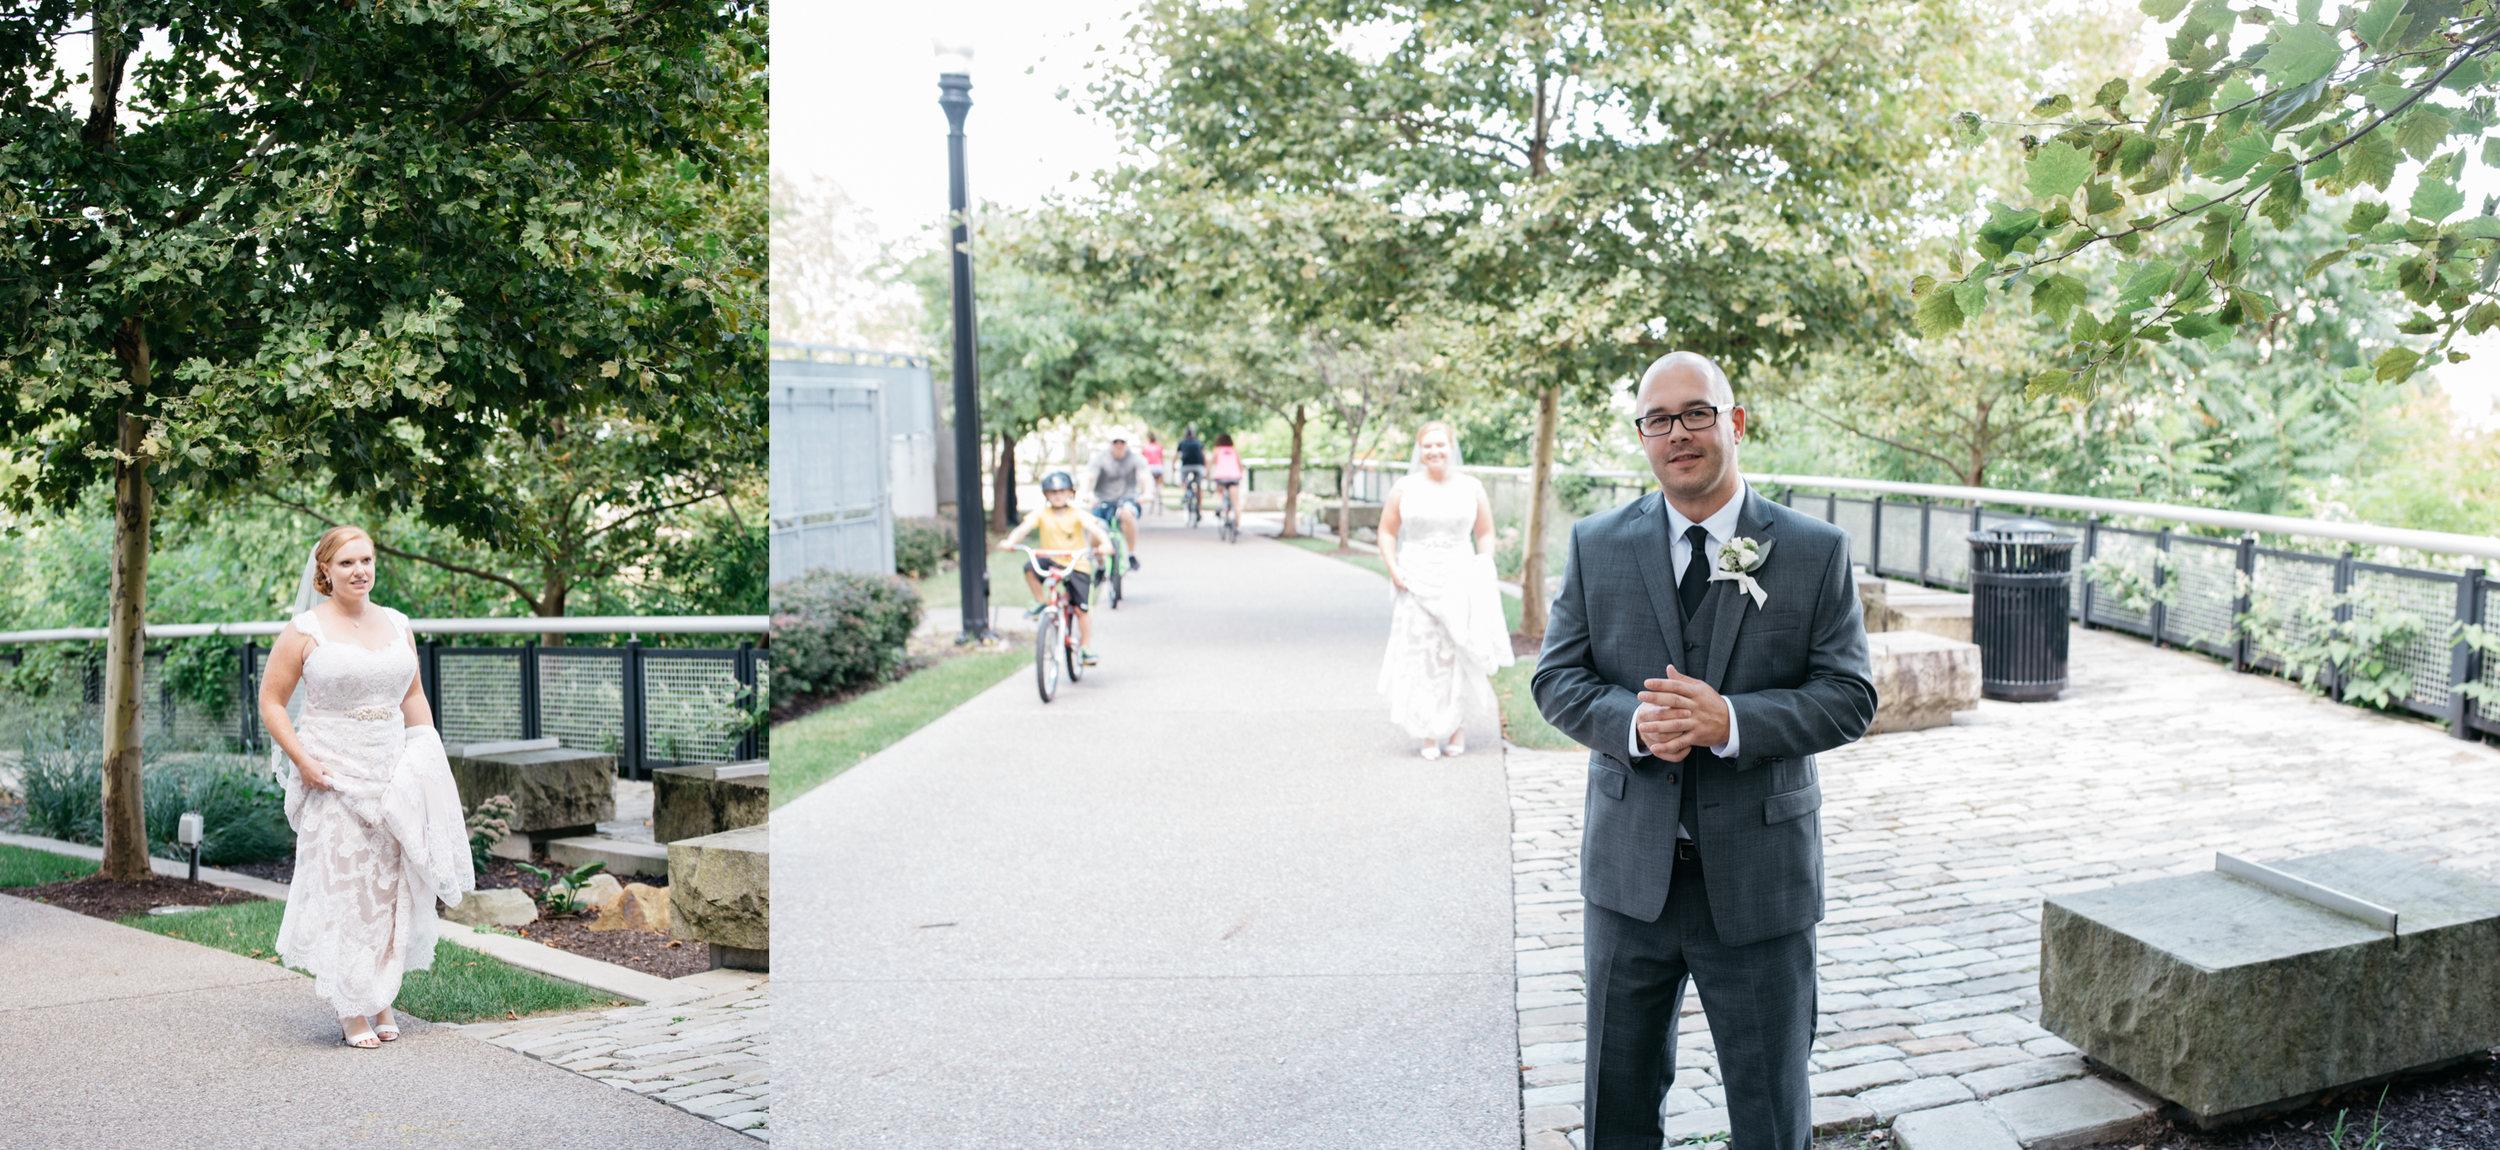 first look wedding photography.jpg